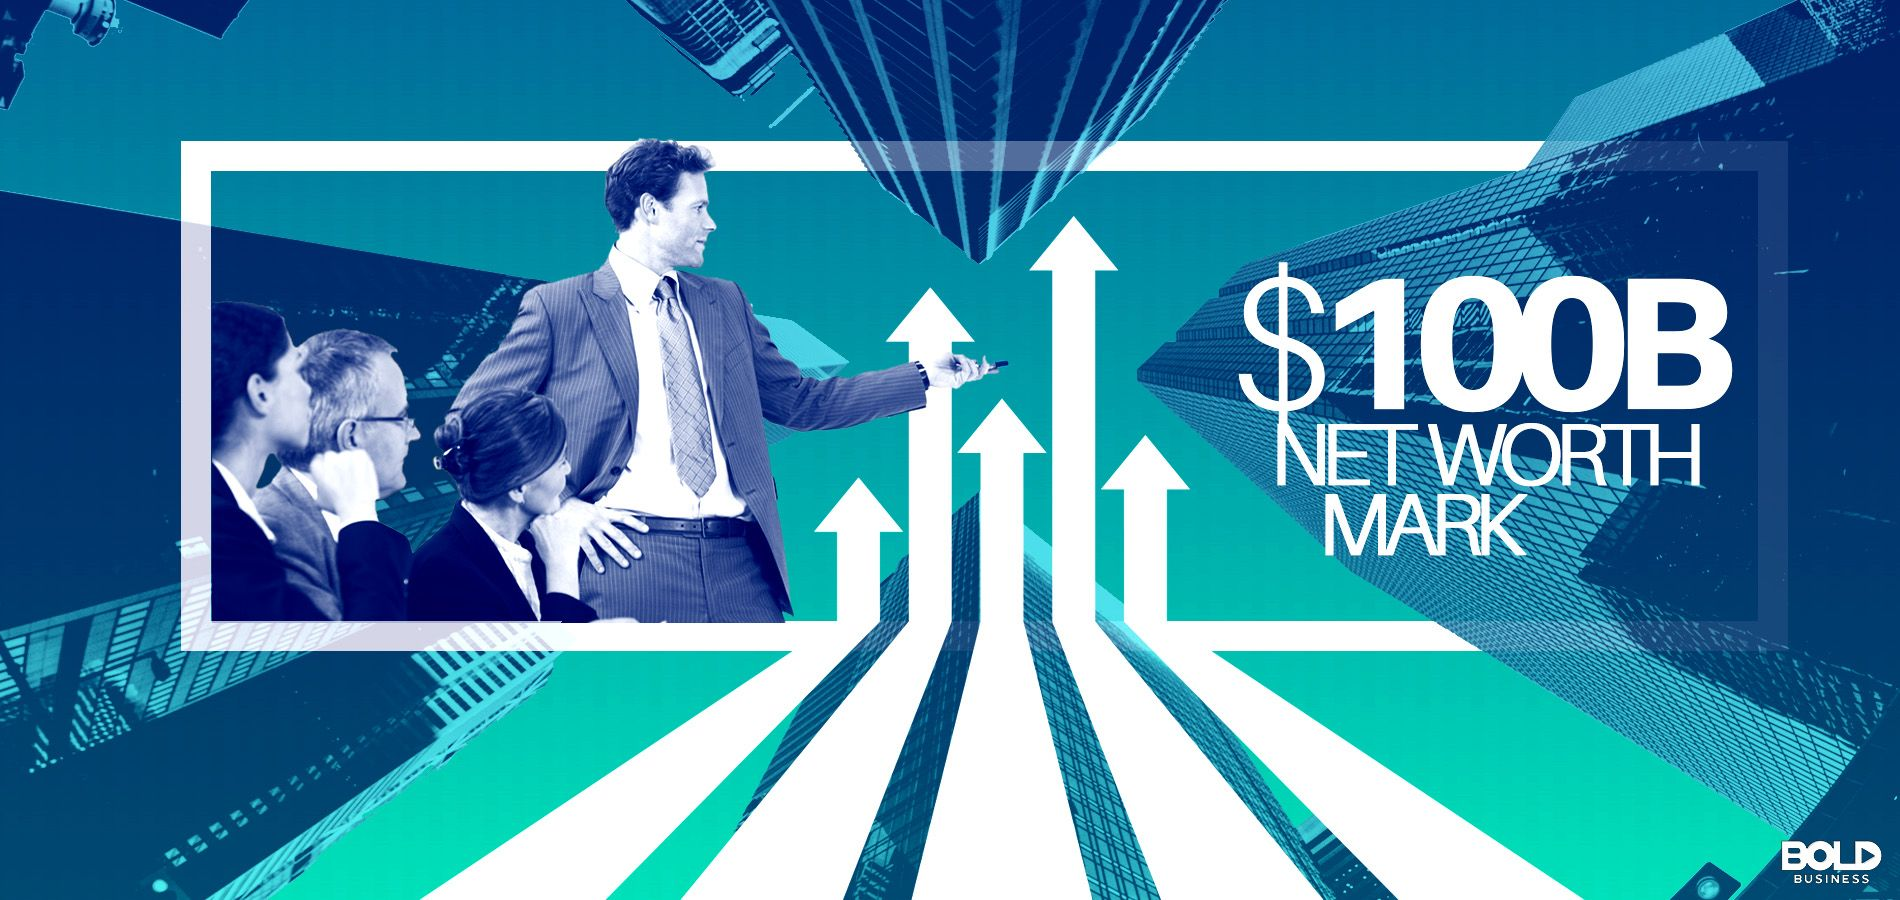 TCS just broke the $100B net worth mark.